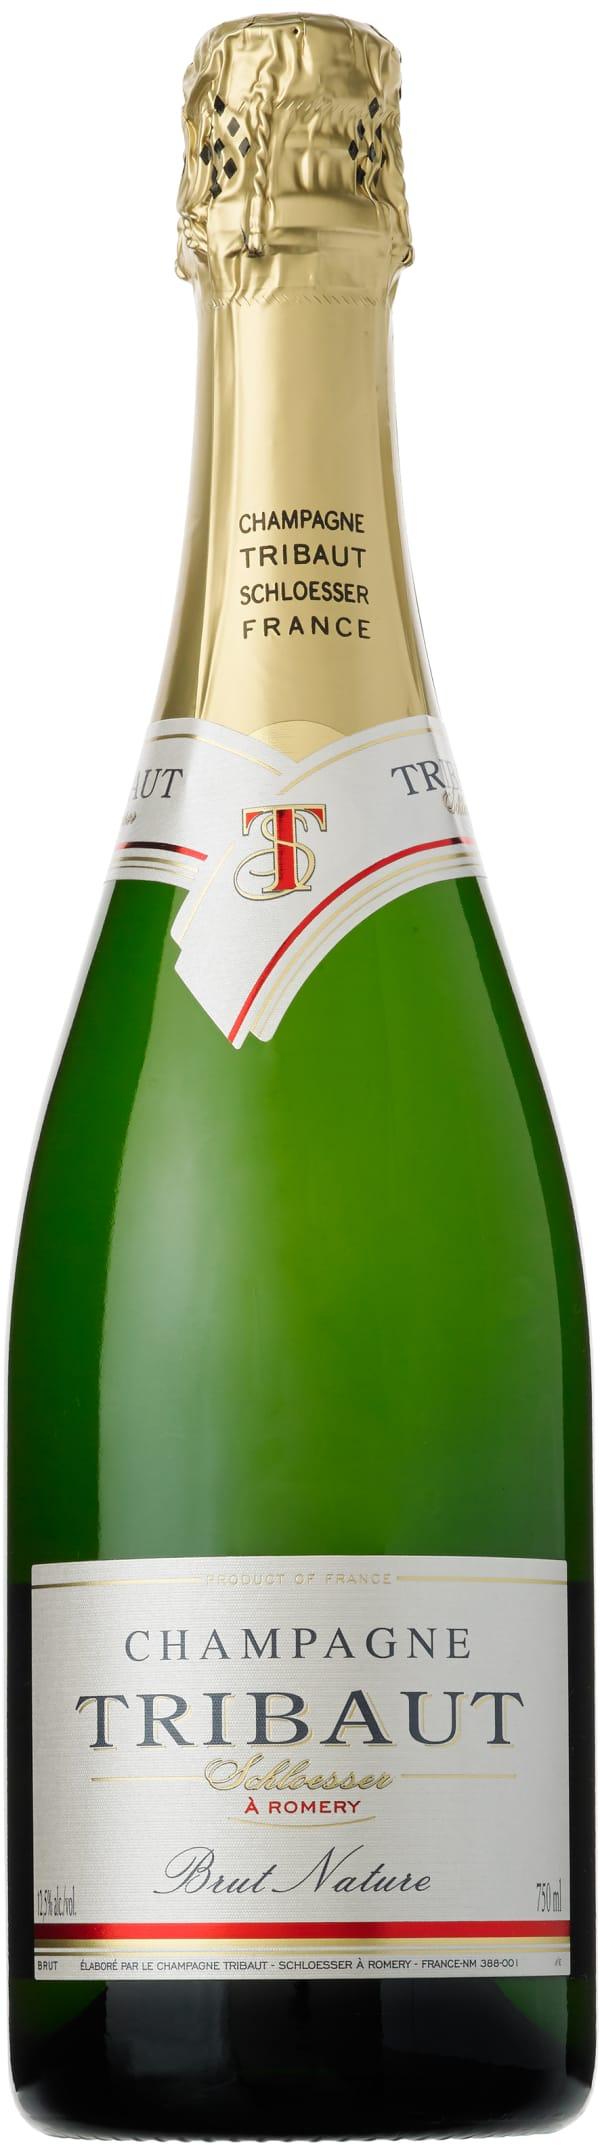 Tribaut Champagne Brut Nature